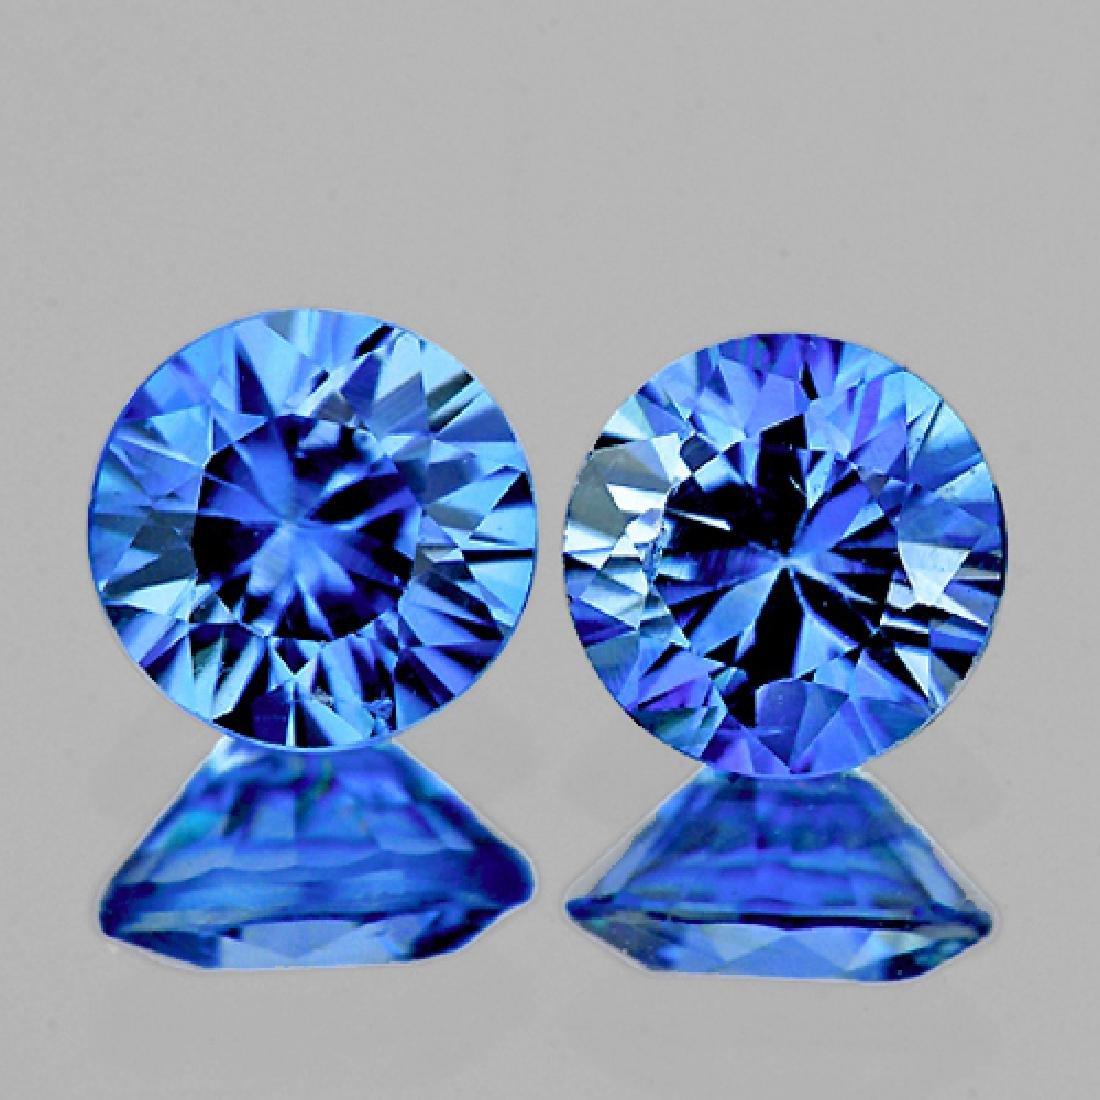 Natural Kashmir Blue Sapphire Pair 3.60 MM - FL